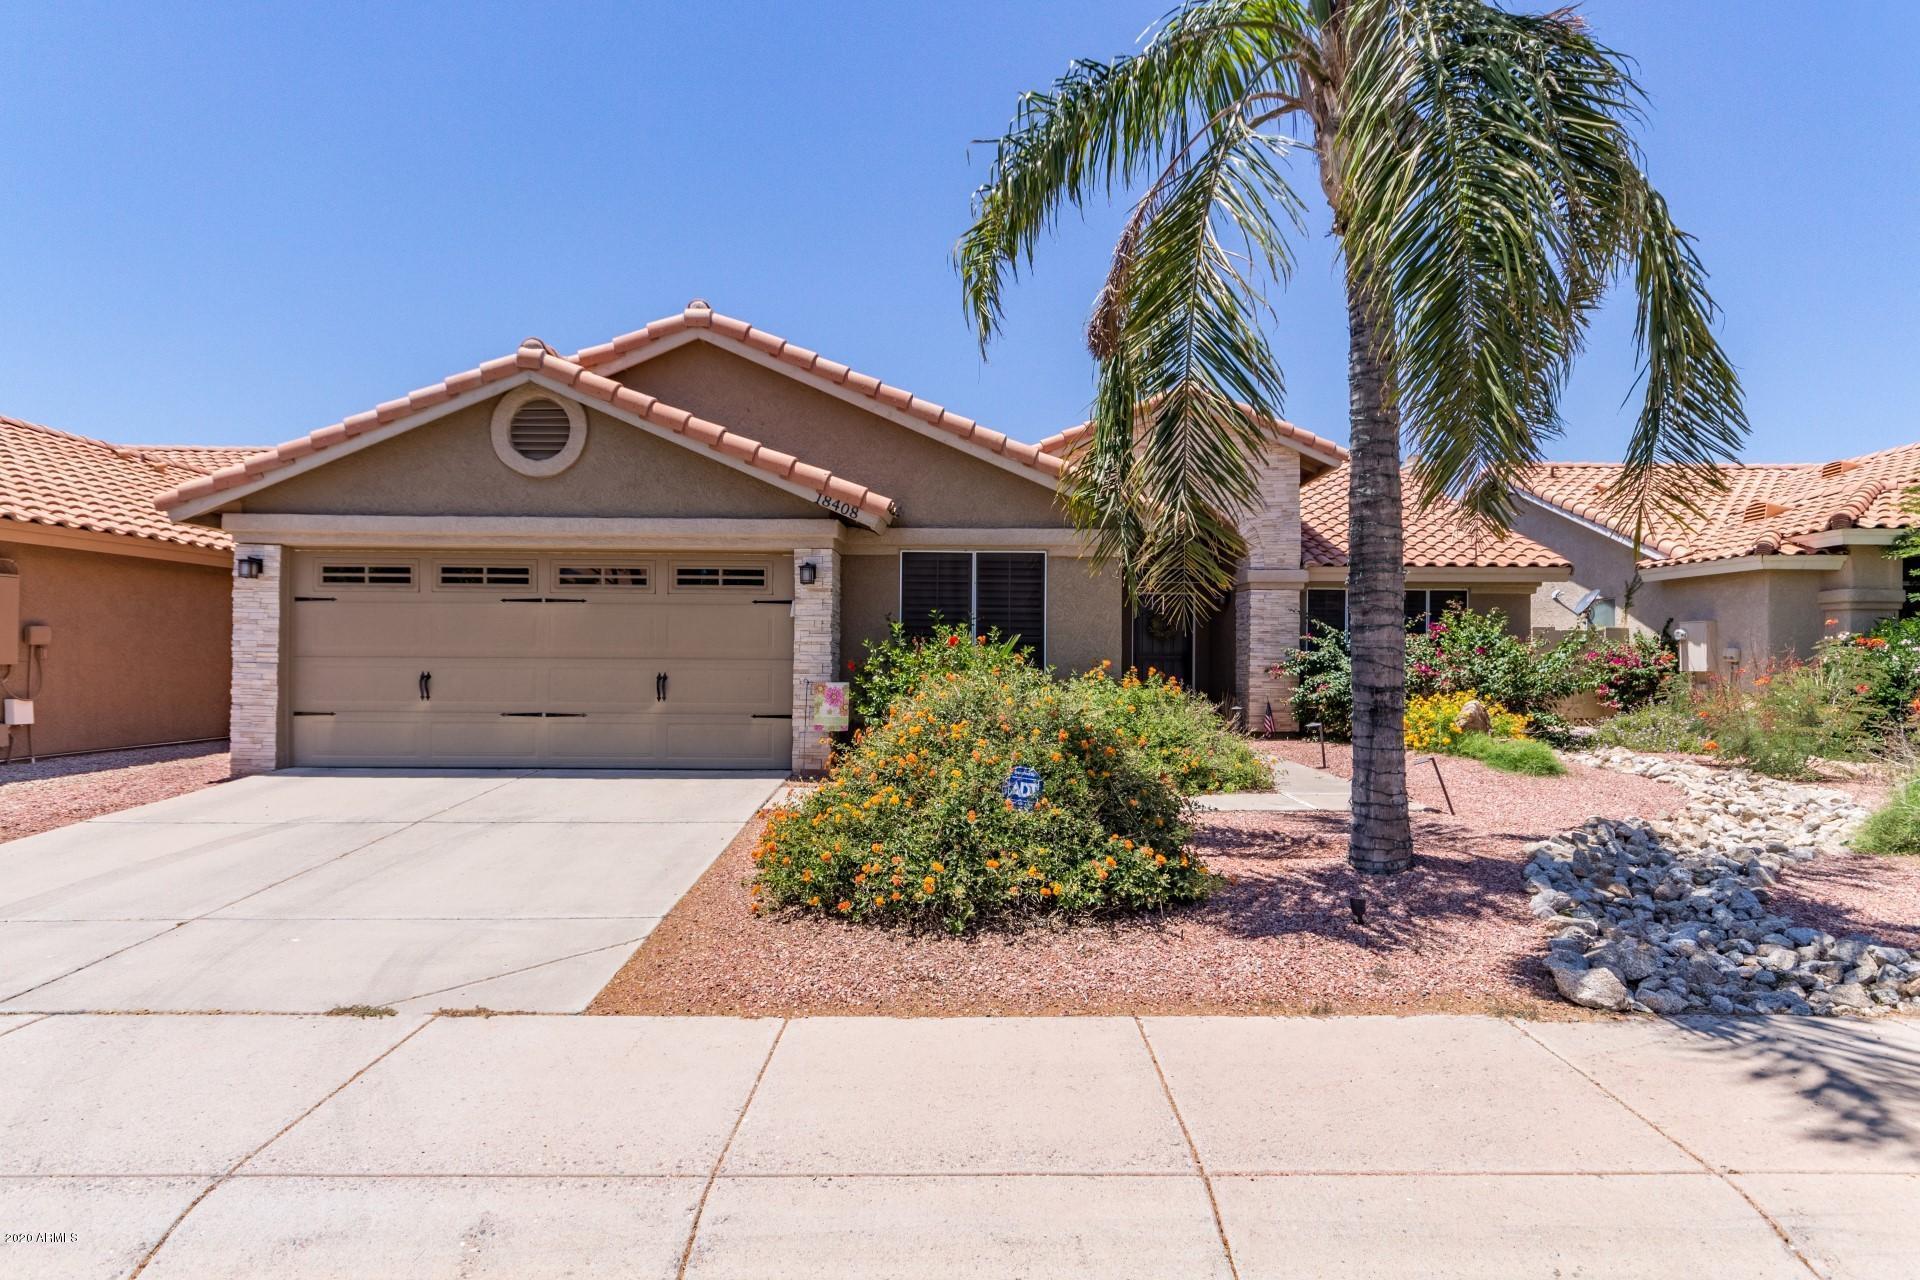 Photo of 18408 N 46TH Way, Phoenix, AZ 85032